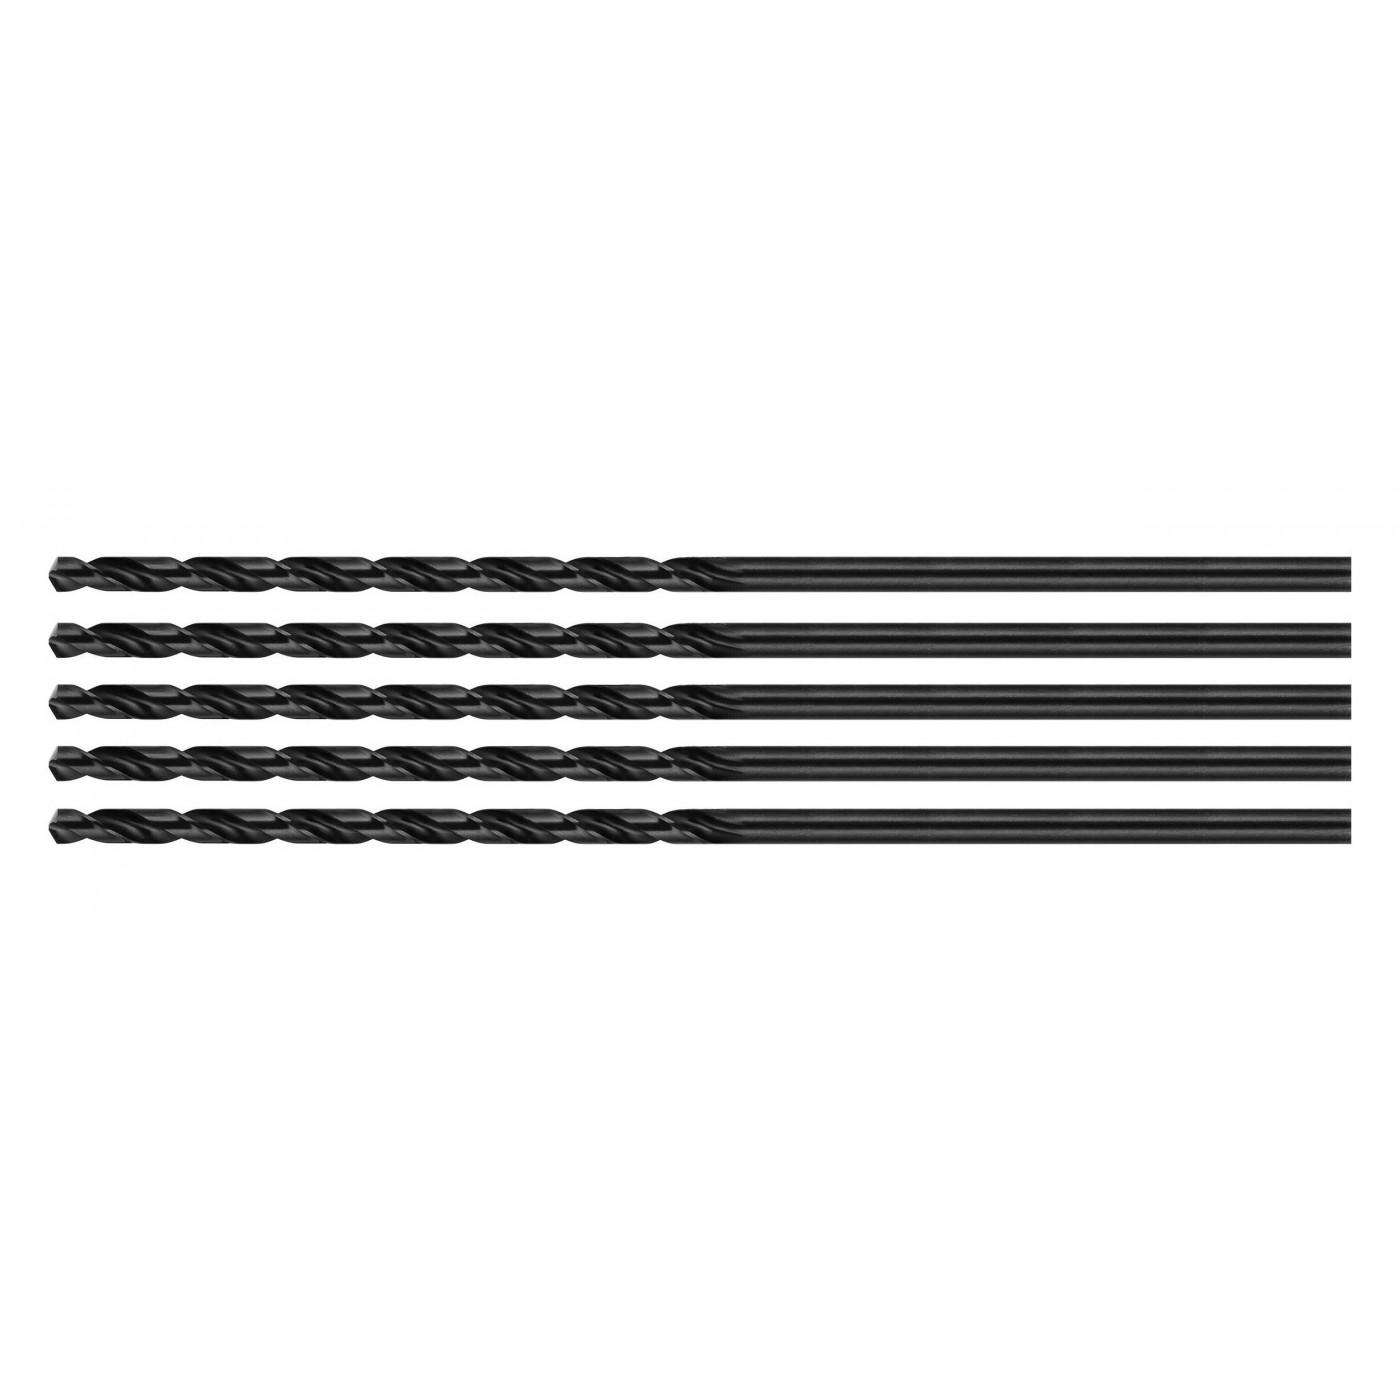 Set of 5 metal drill bits, extra long (5.0x350 mm)